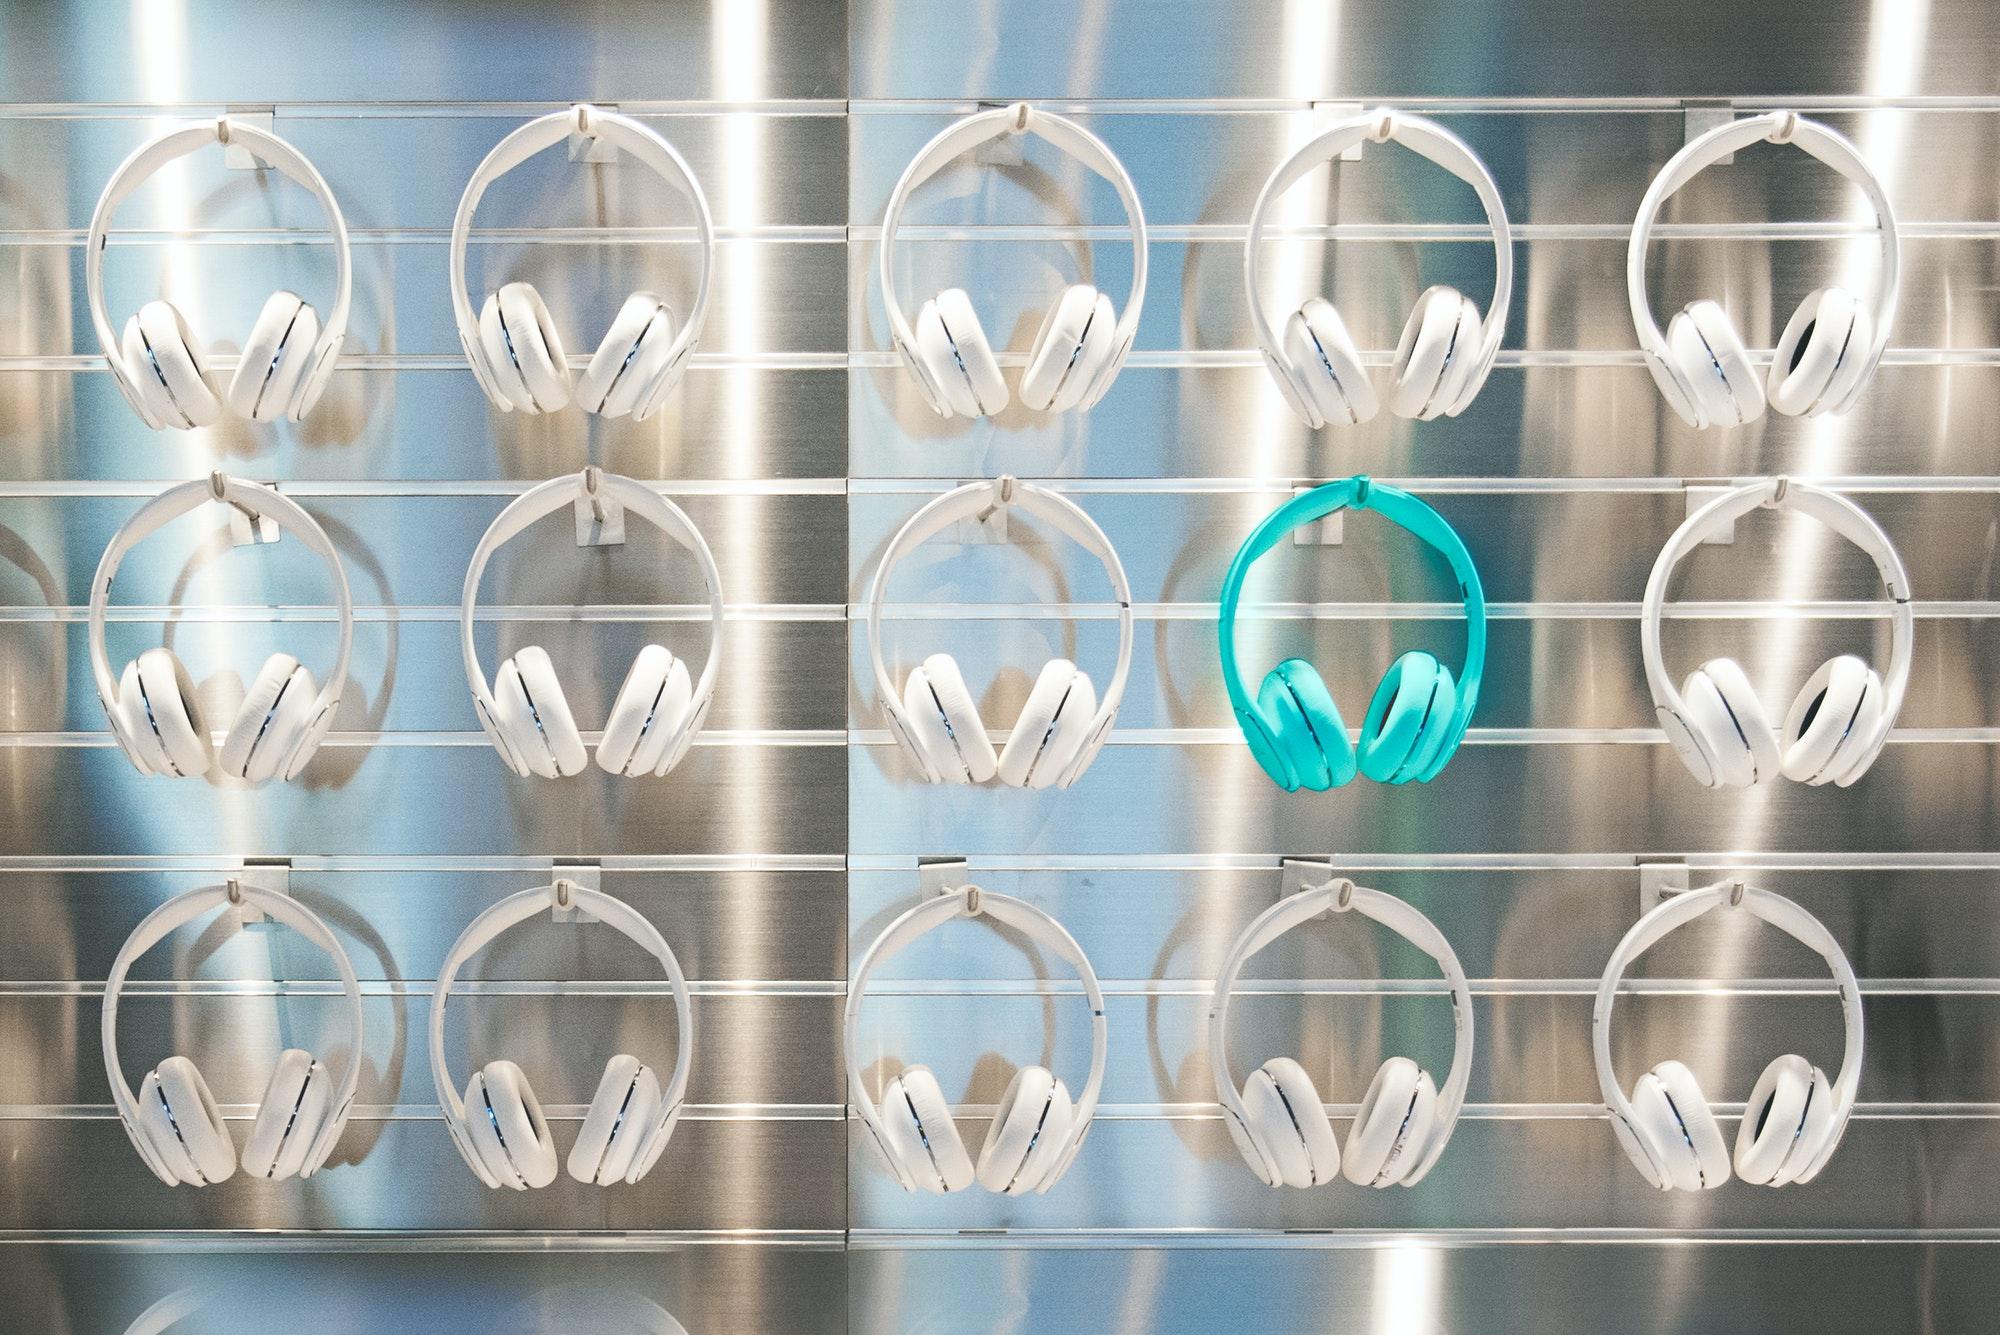 Wall of headphones